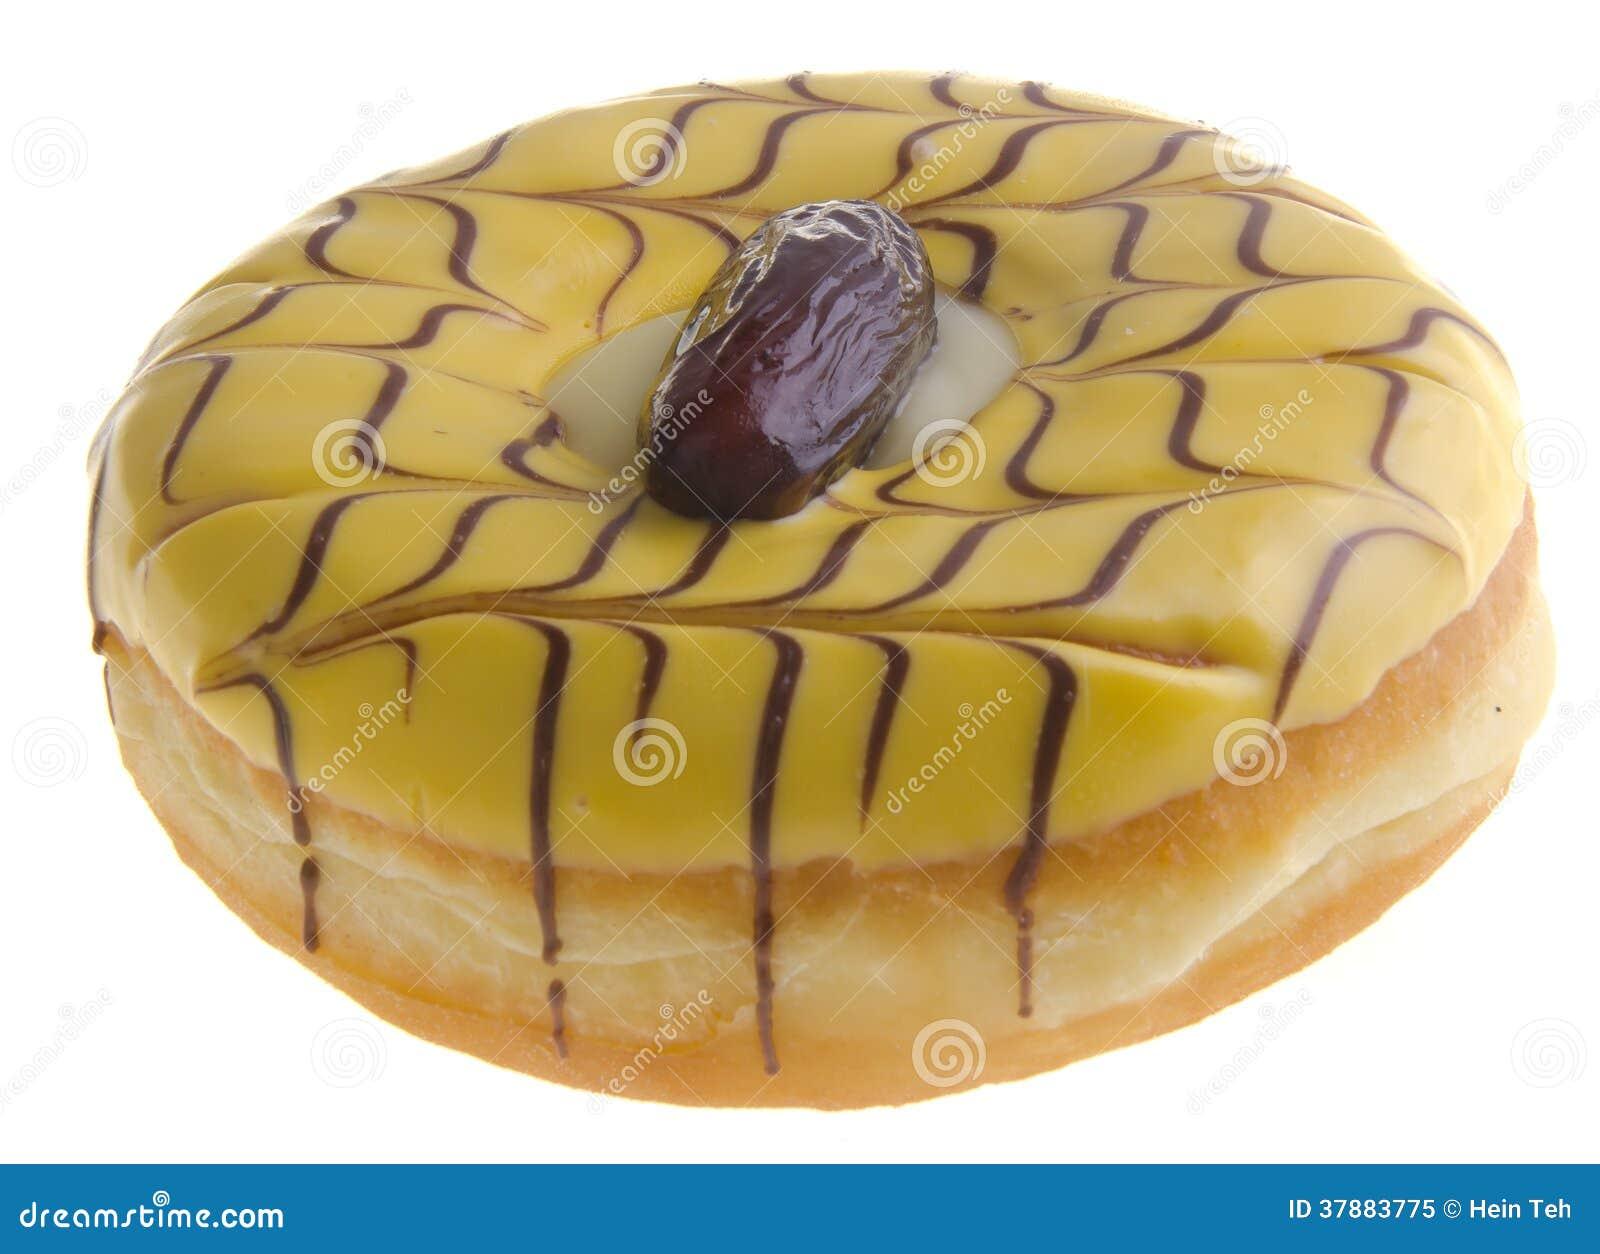 Doughnut die op witte achtergrond wordt geïsoleerd